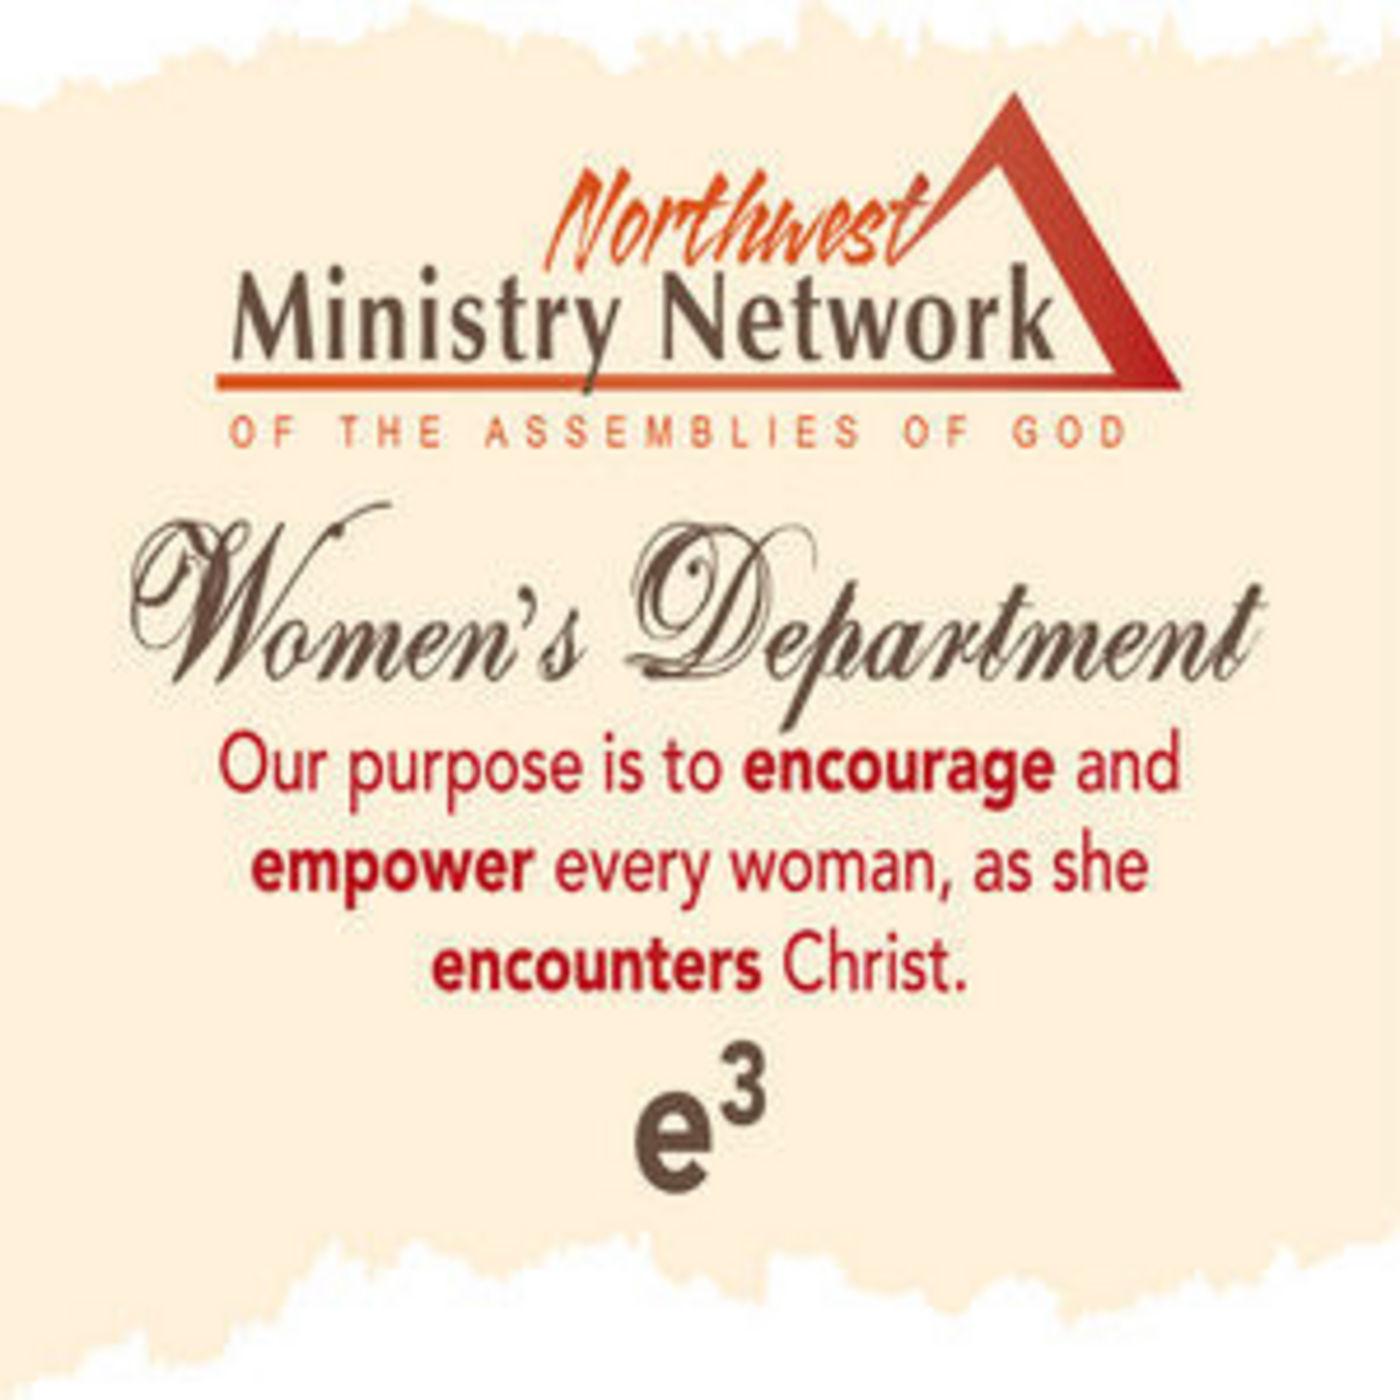 <![CDATA[NWMN Women's Ministries]]>